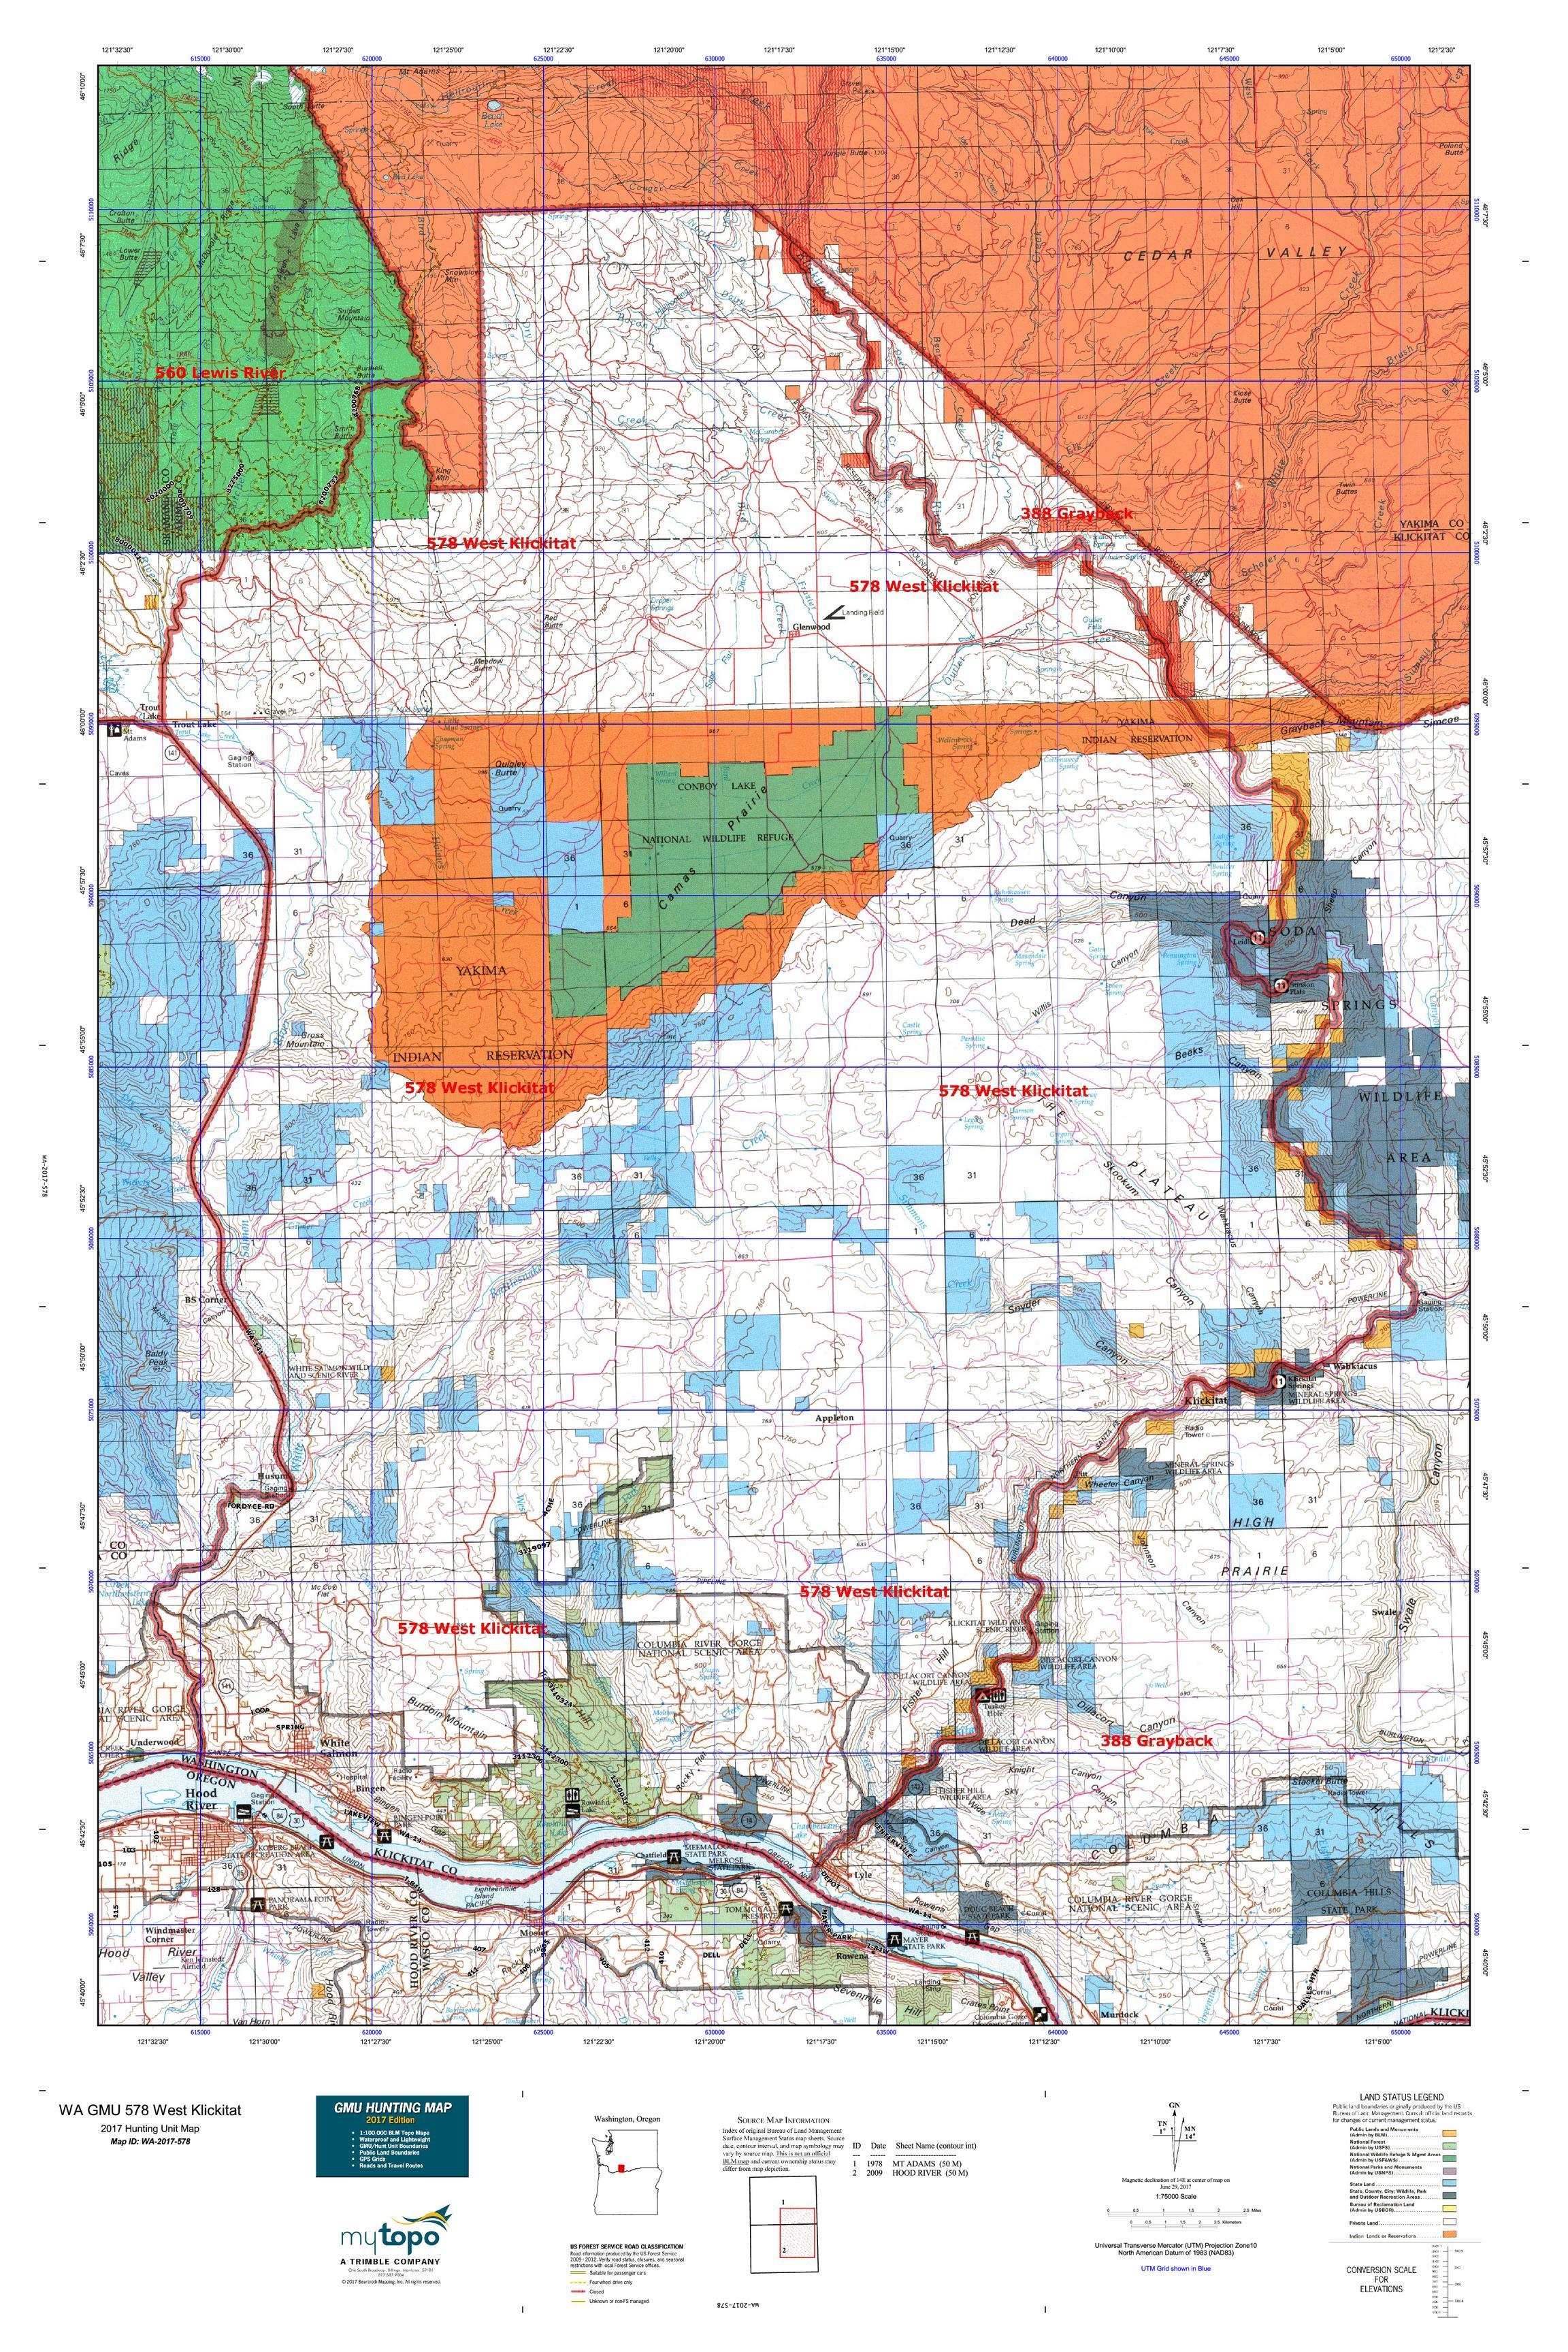 WA GMU 578 West Klickitat Map MyTopo